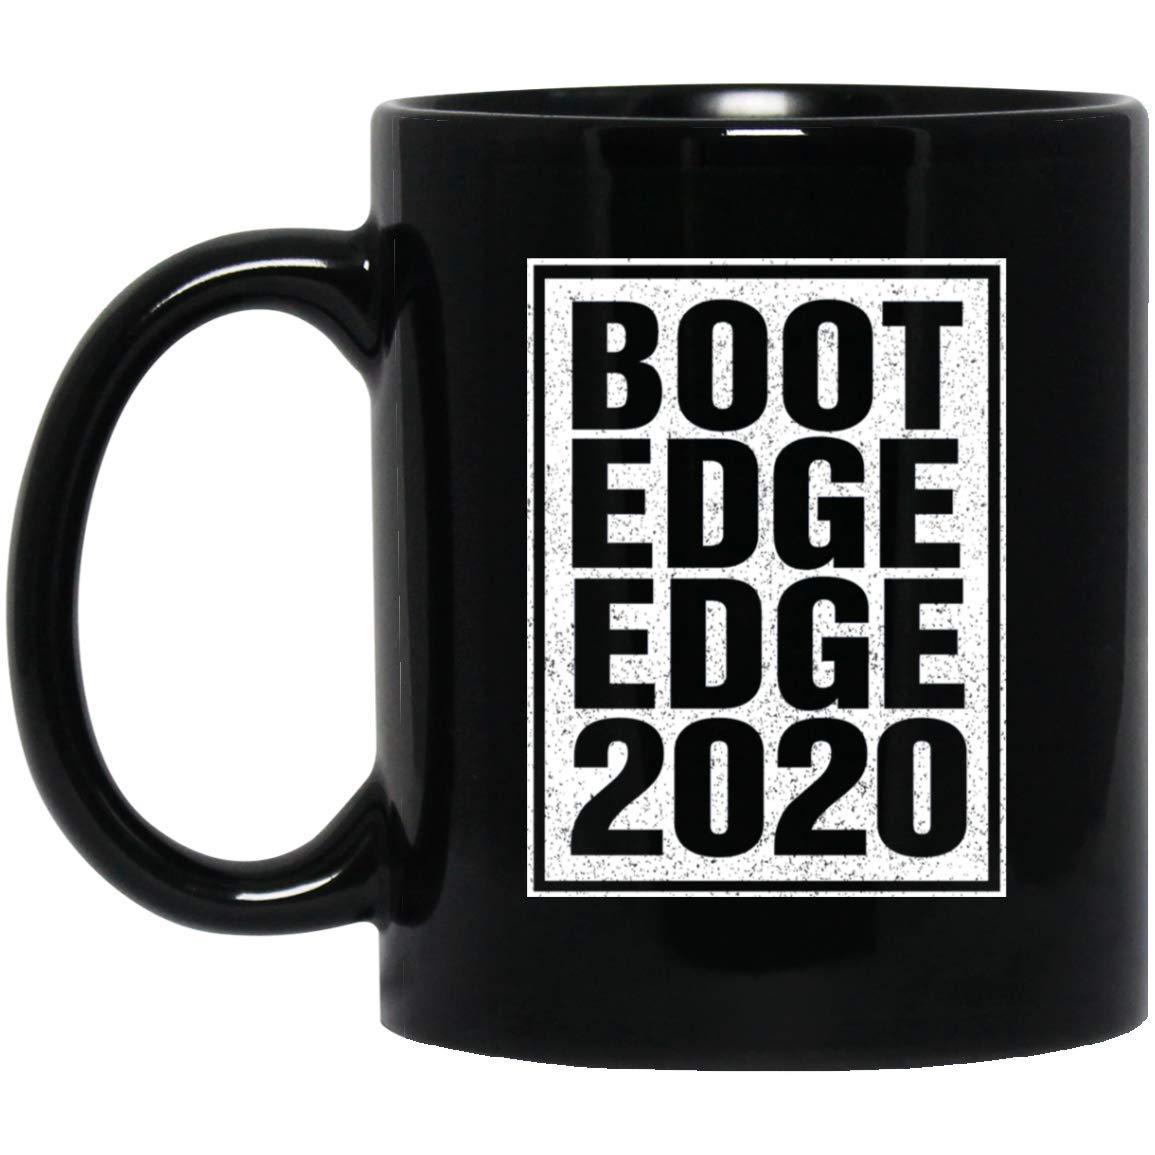 Best Gift Cards 2020 Amazon.com: Boot Edge Edge 2020 Coffee mug Pete Buttigieg 2020